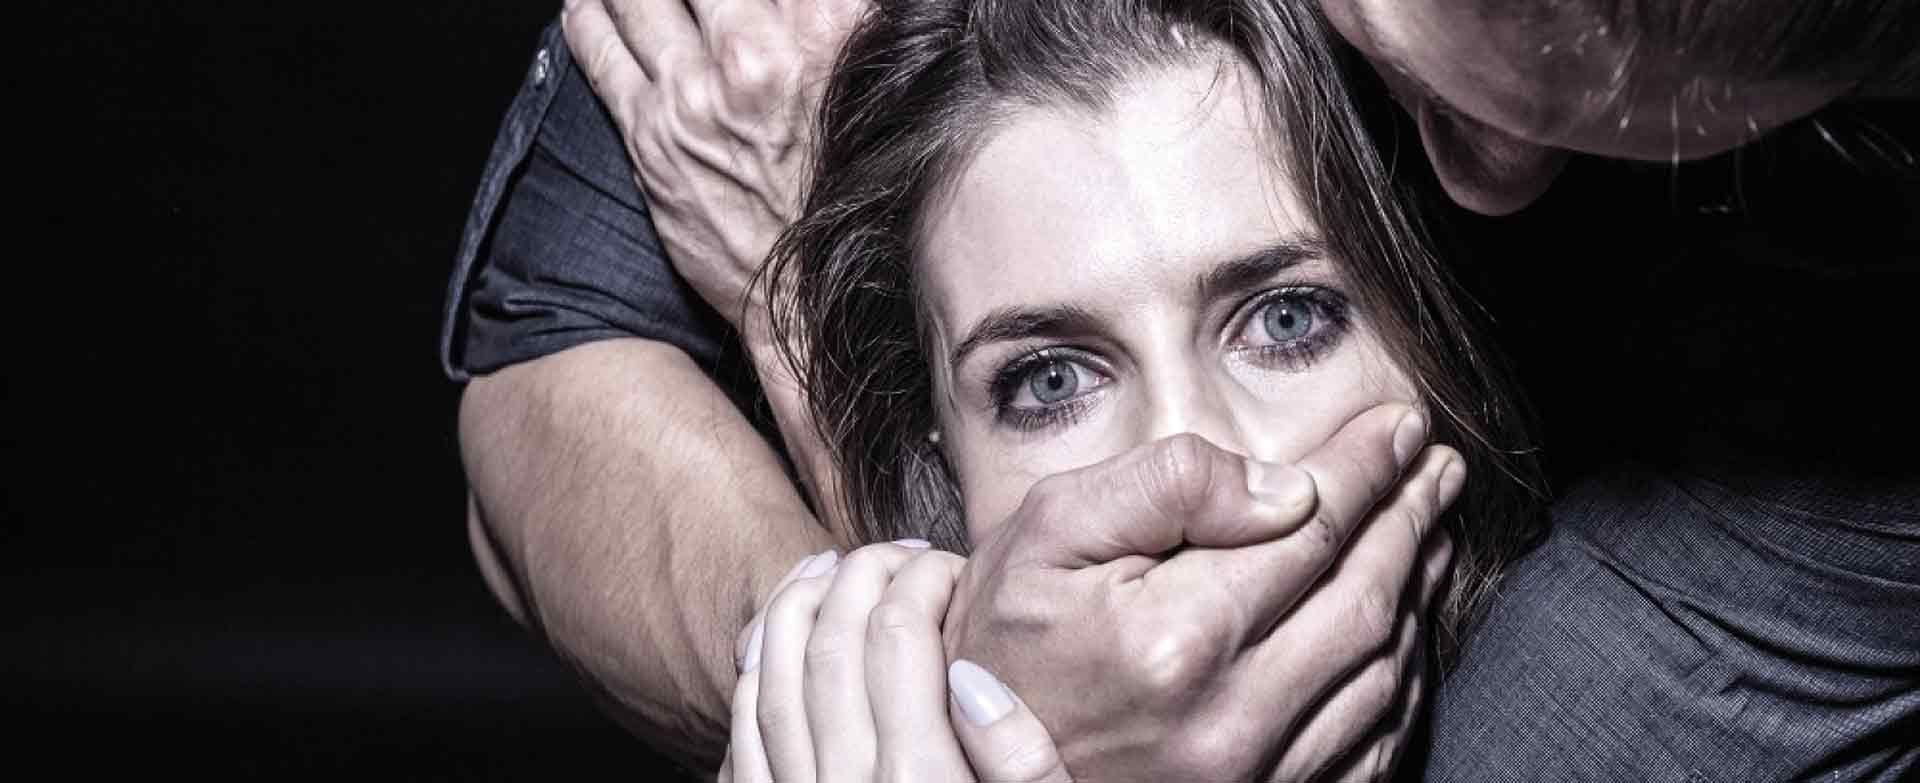 informareonline-femminicidio